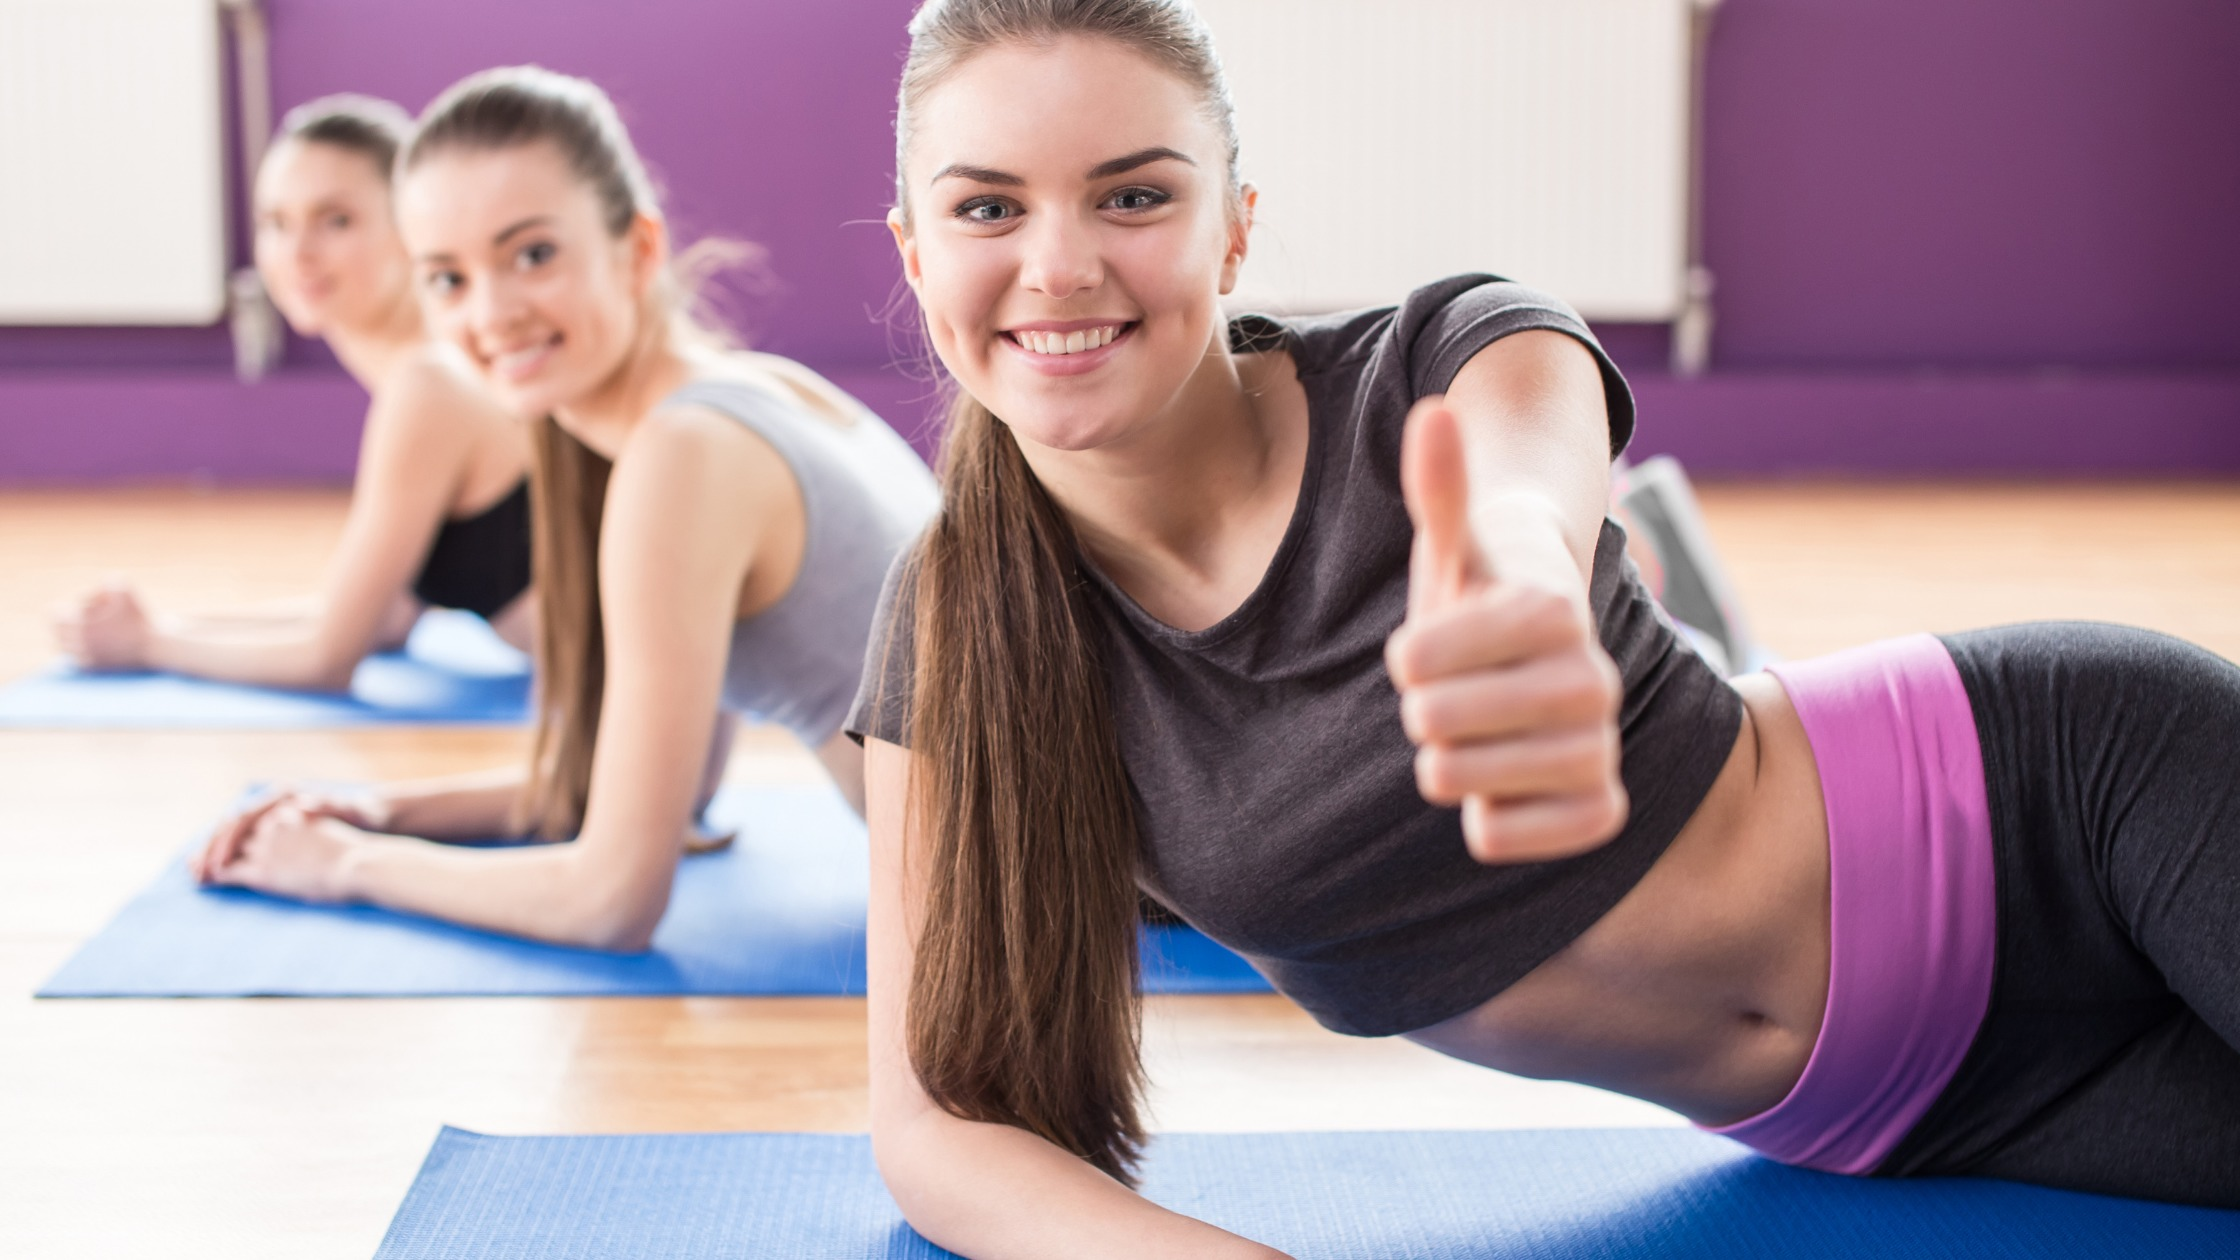 4 Fitness Tips For Beginners